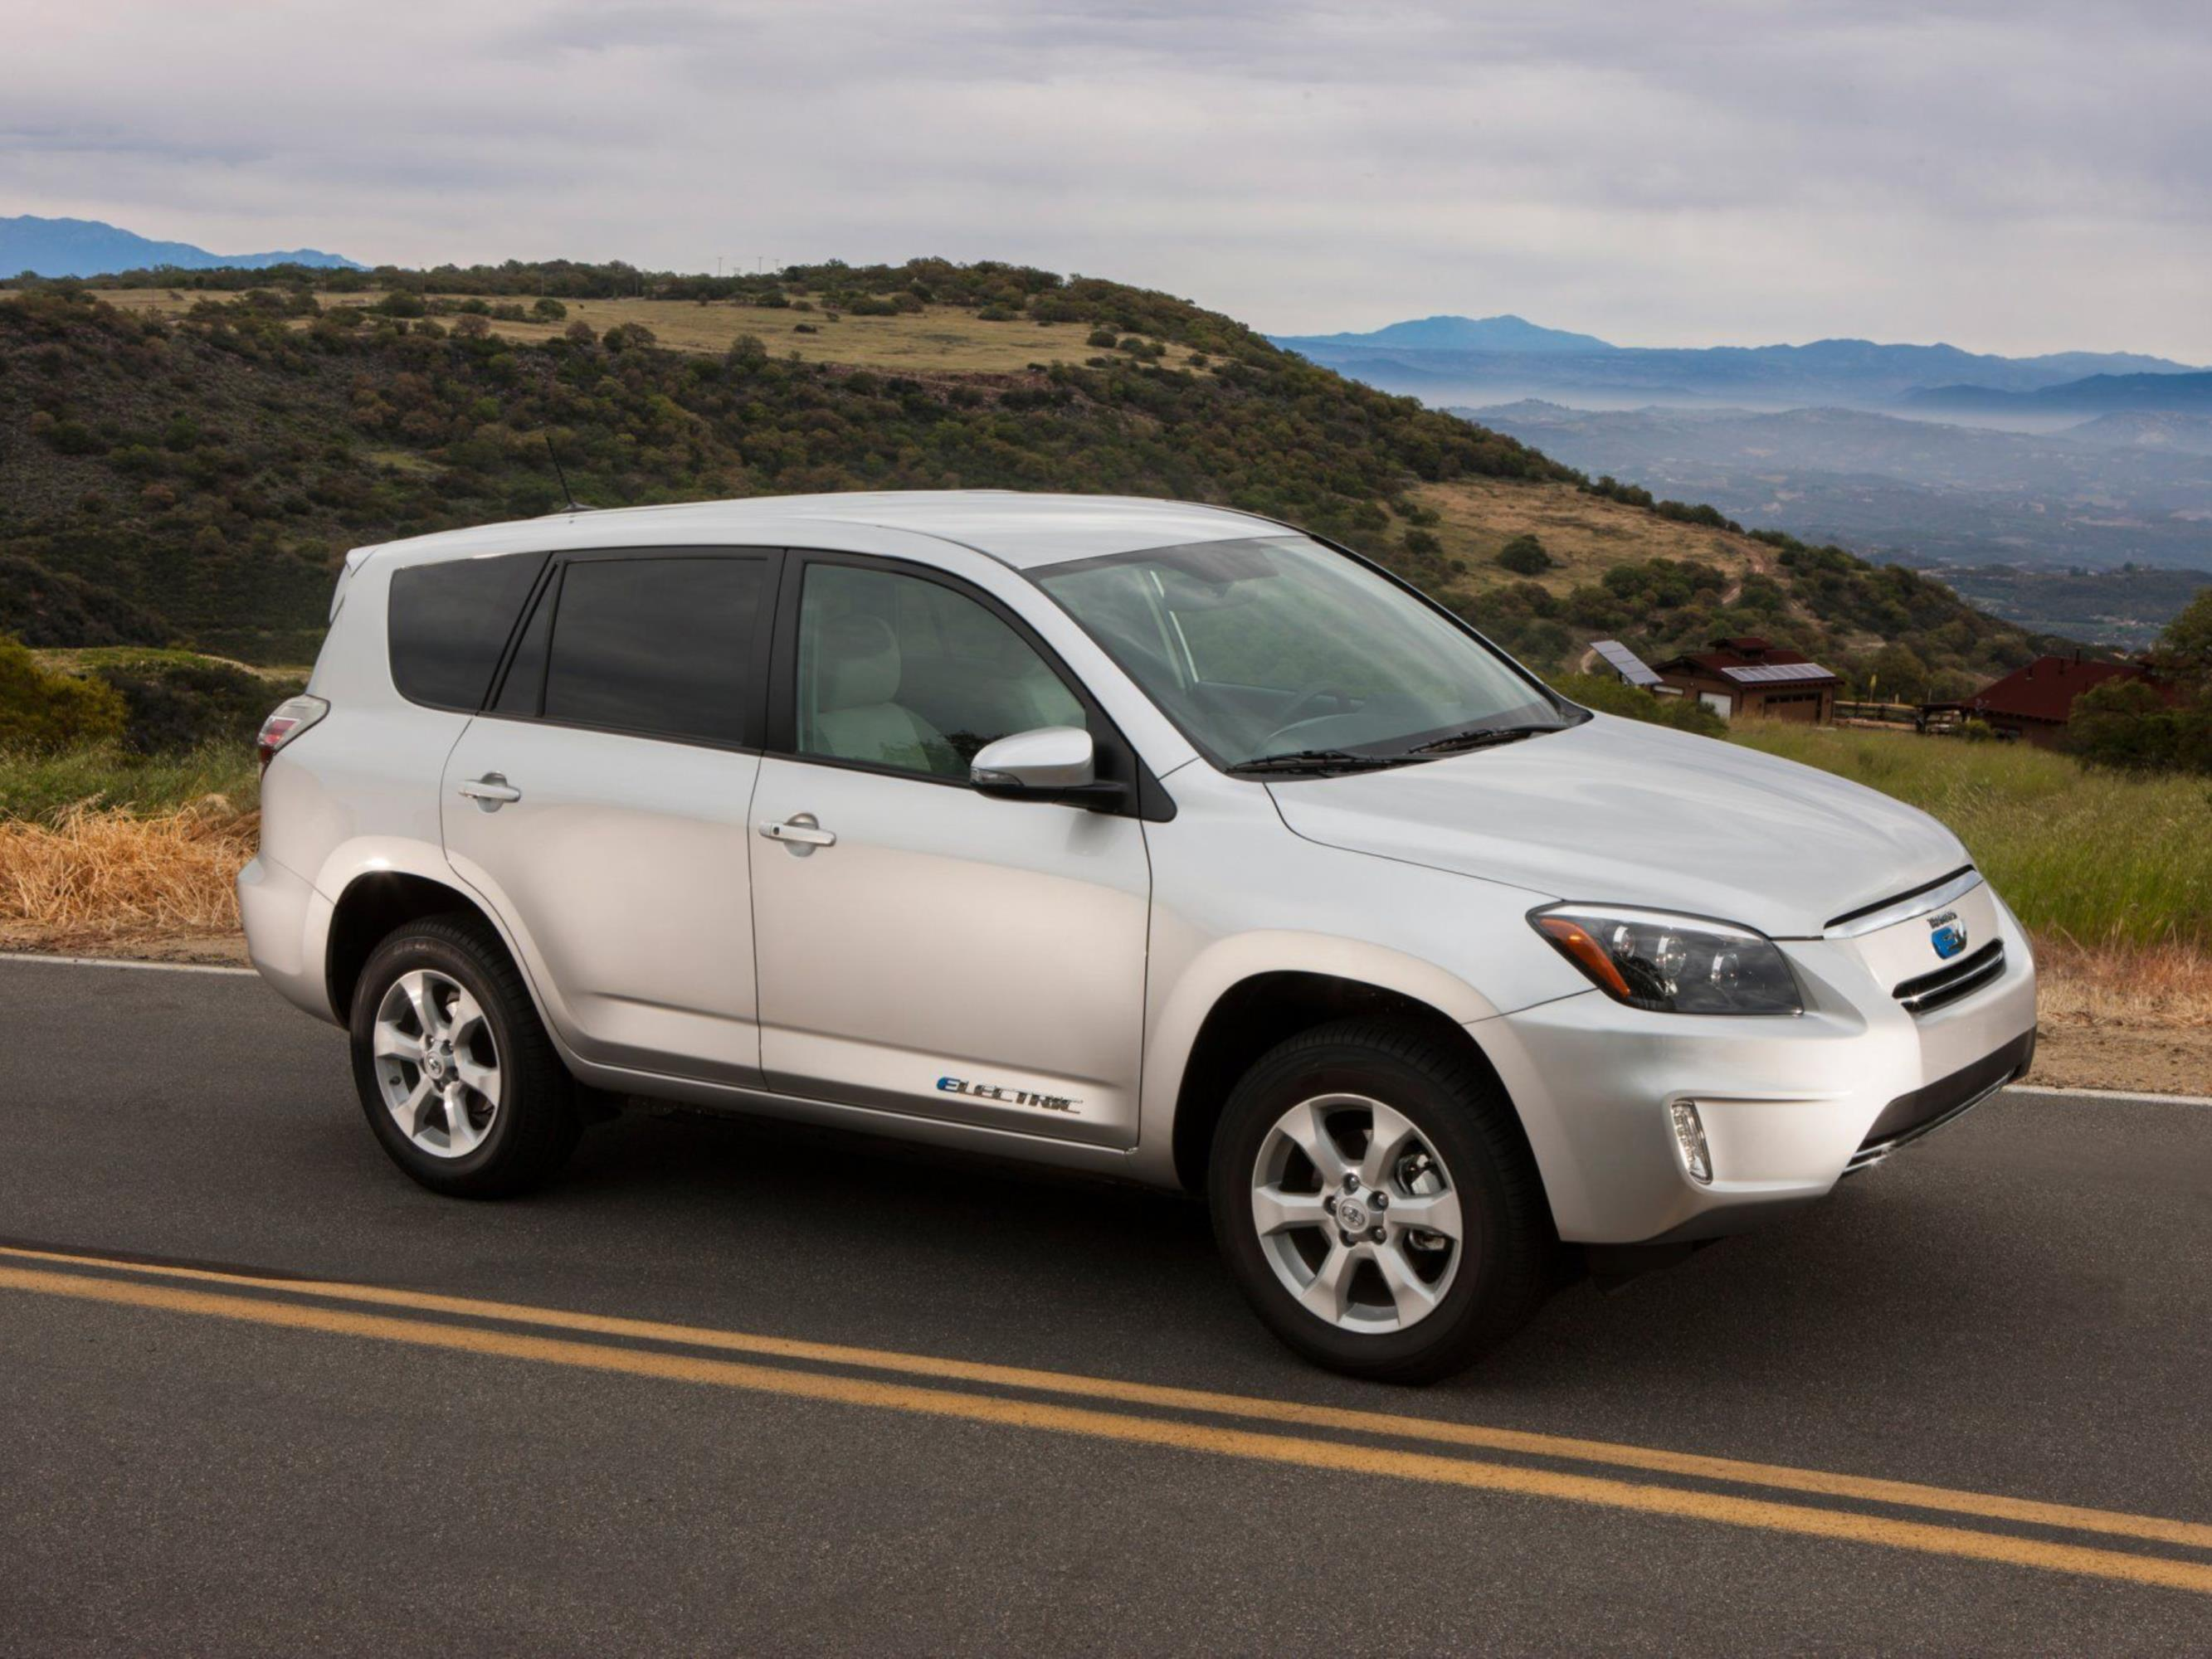 Kompakt-SUV Toyota RAV4 mit Elektroantrieb startet in Kalifornien